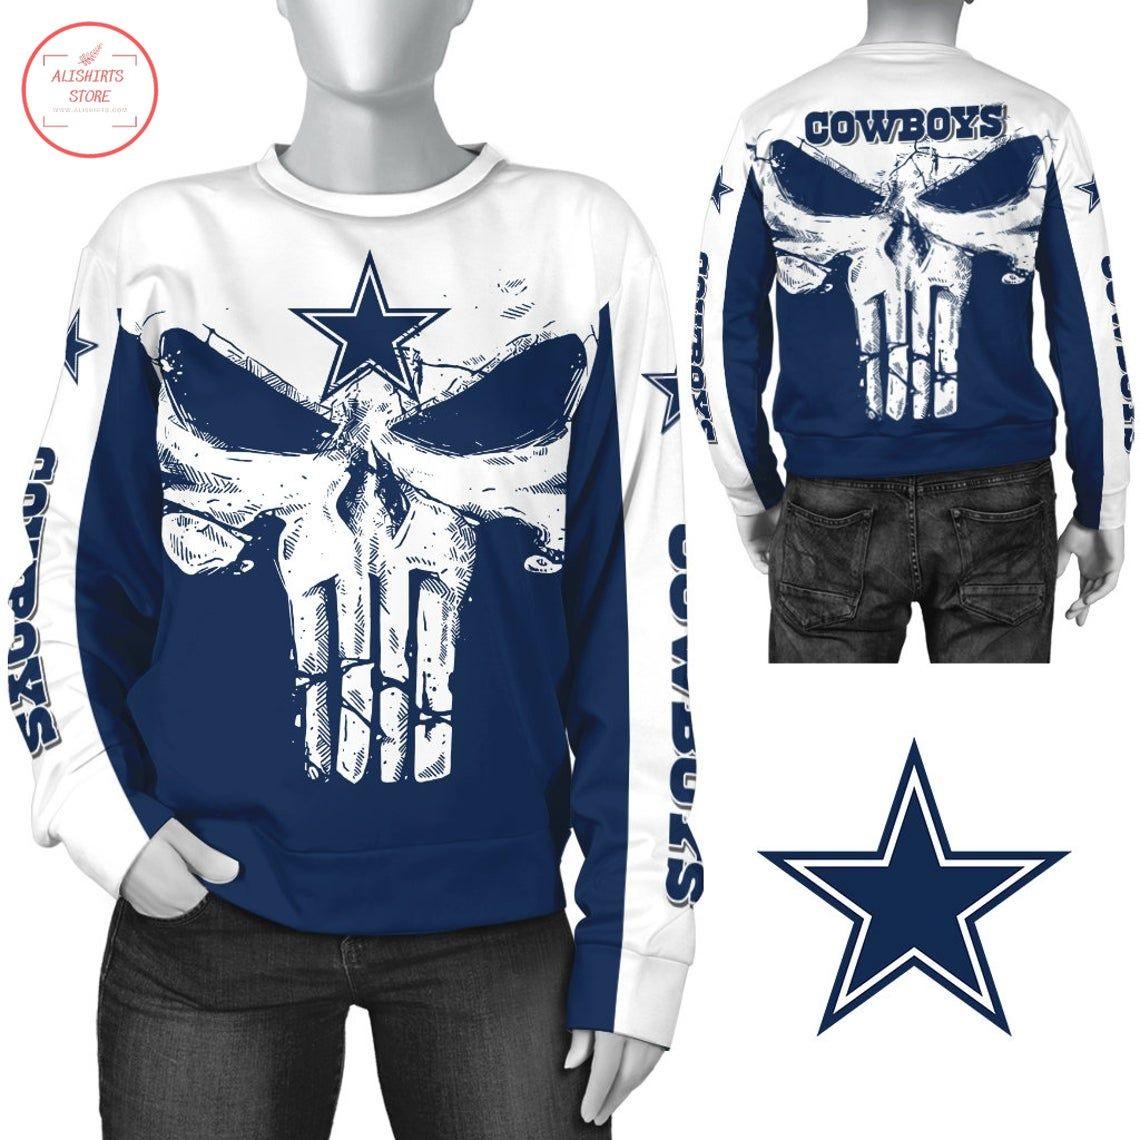 Dallas Cowboys NFL Punisher Skull Sweatshirt